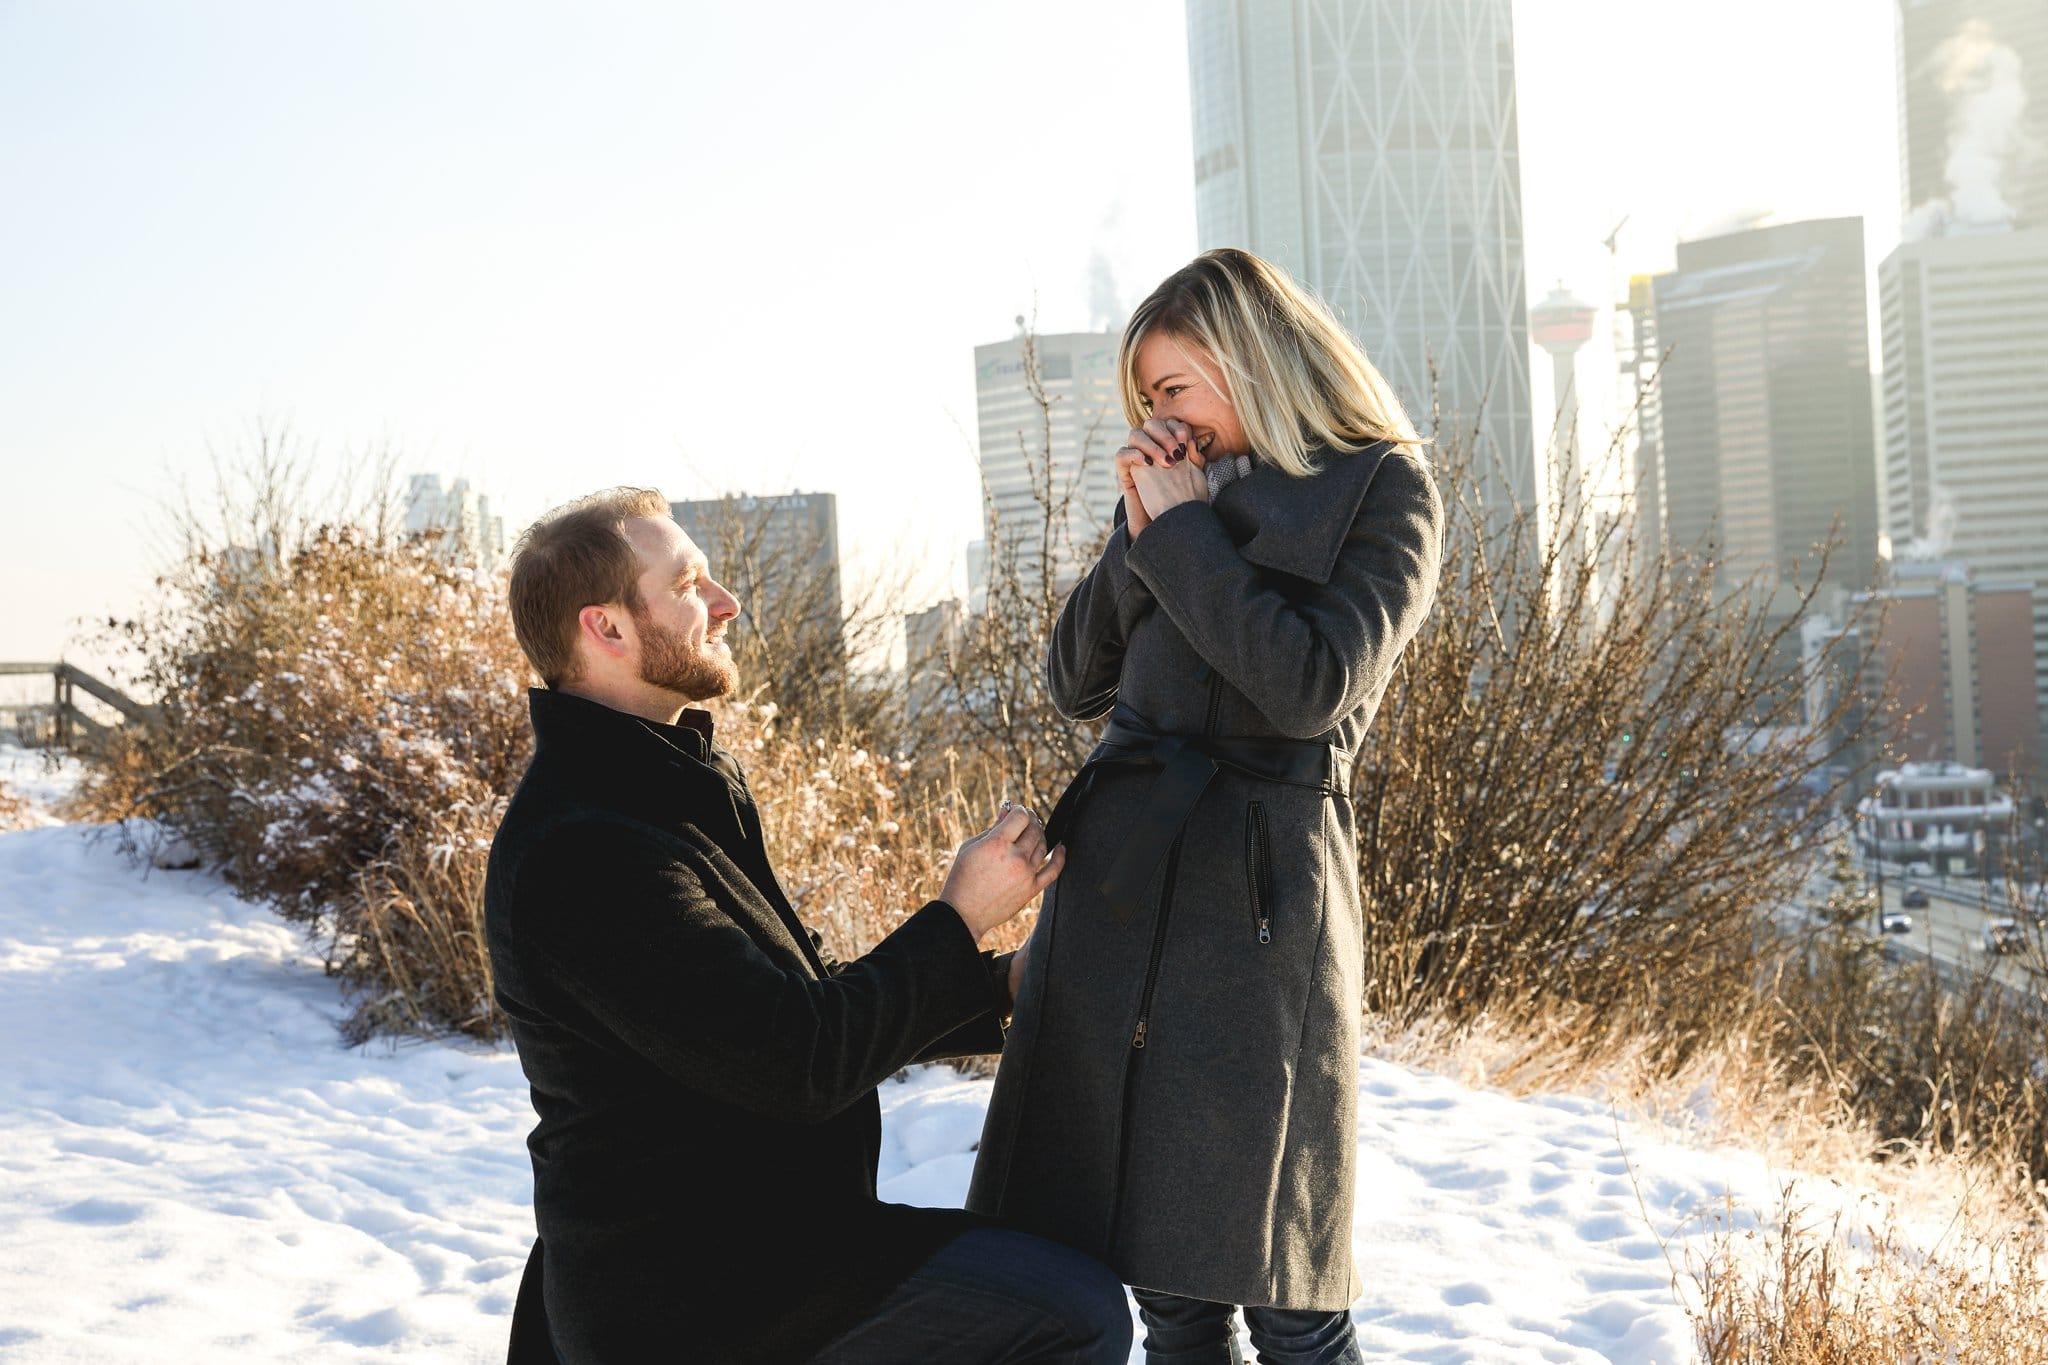 Ashley Daphne Photography Calgary Couple Wedding Photographer Engagement Photos Proposal Photos_0025.jpg